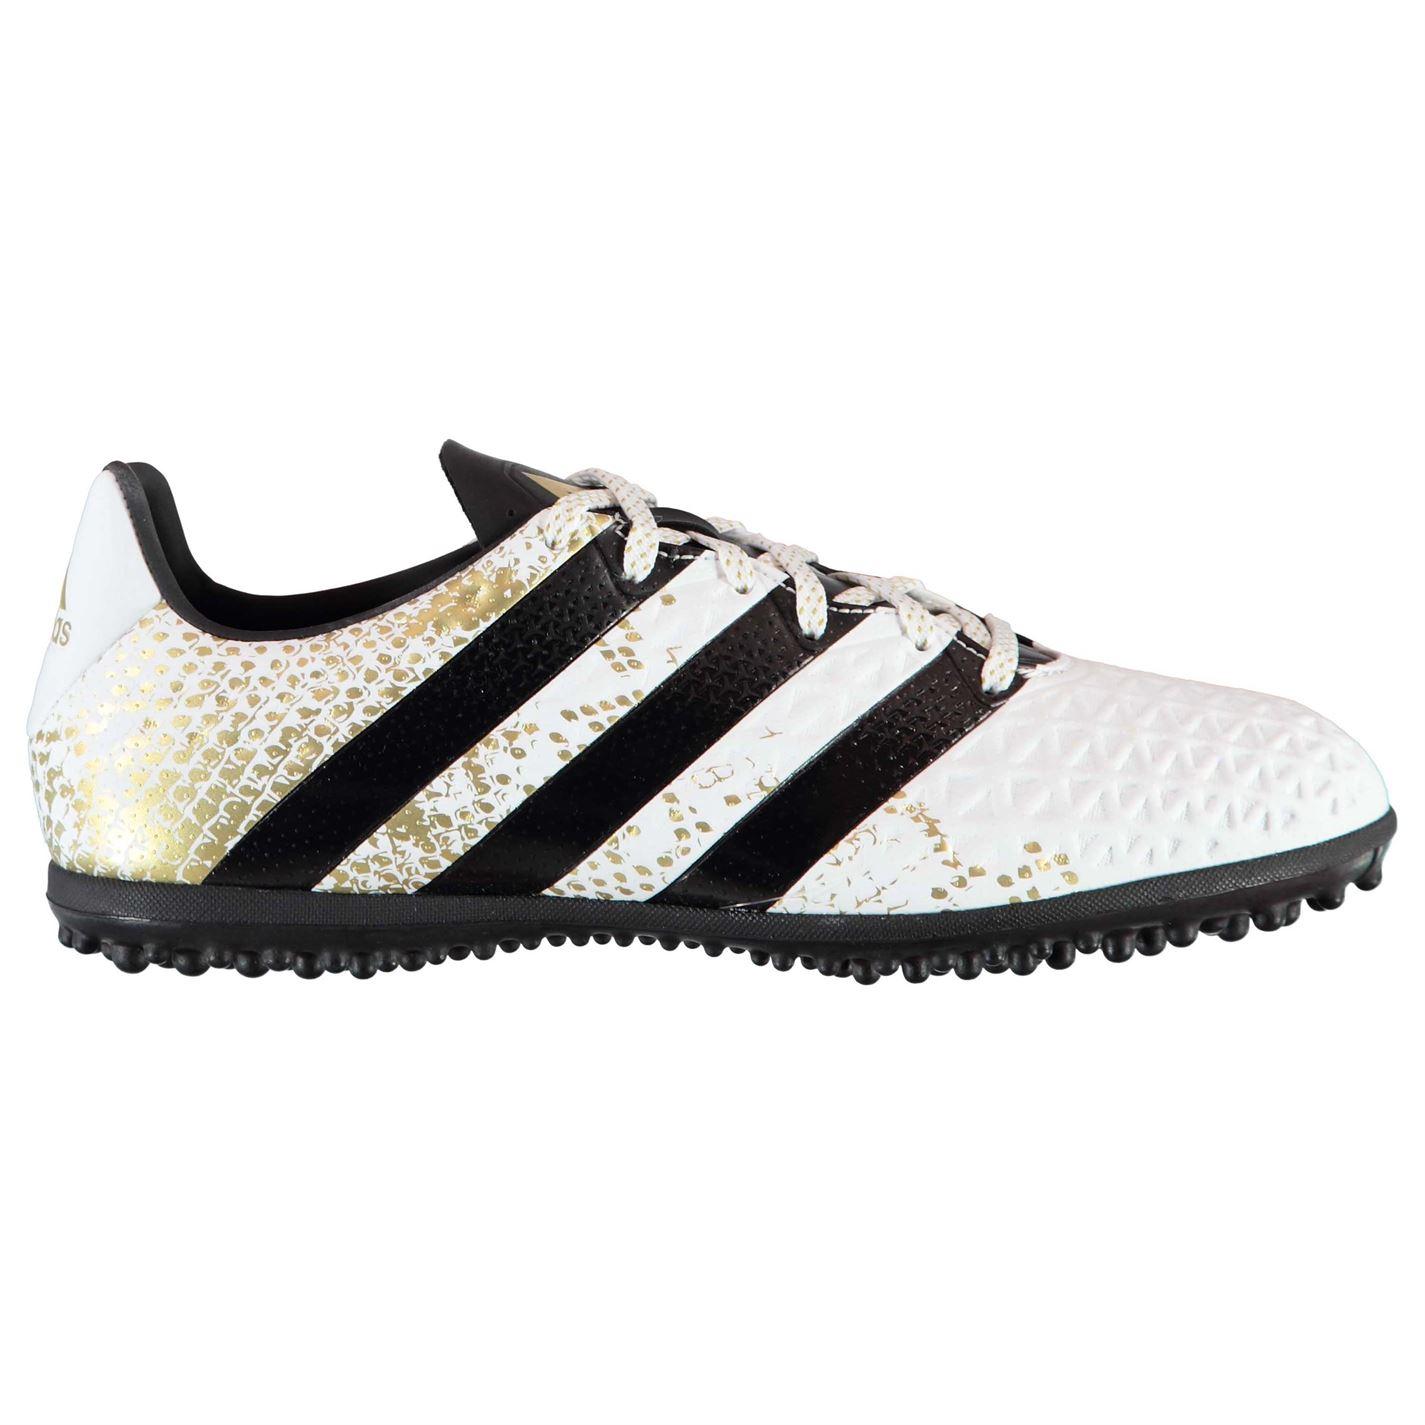 adidas Ace 16.3 pánské TF Football Trainers White Black Gld - Glami.sk 1a9340cee2